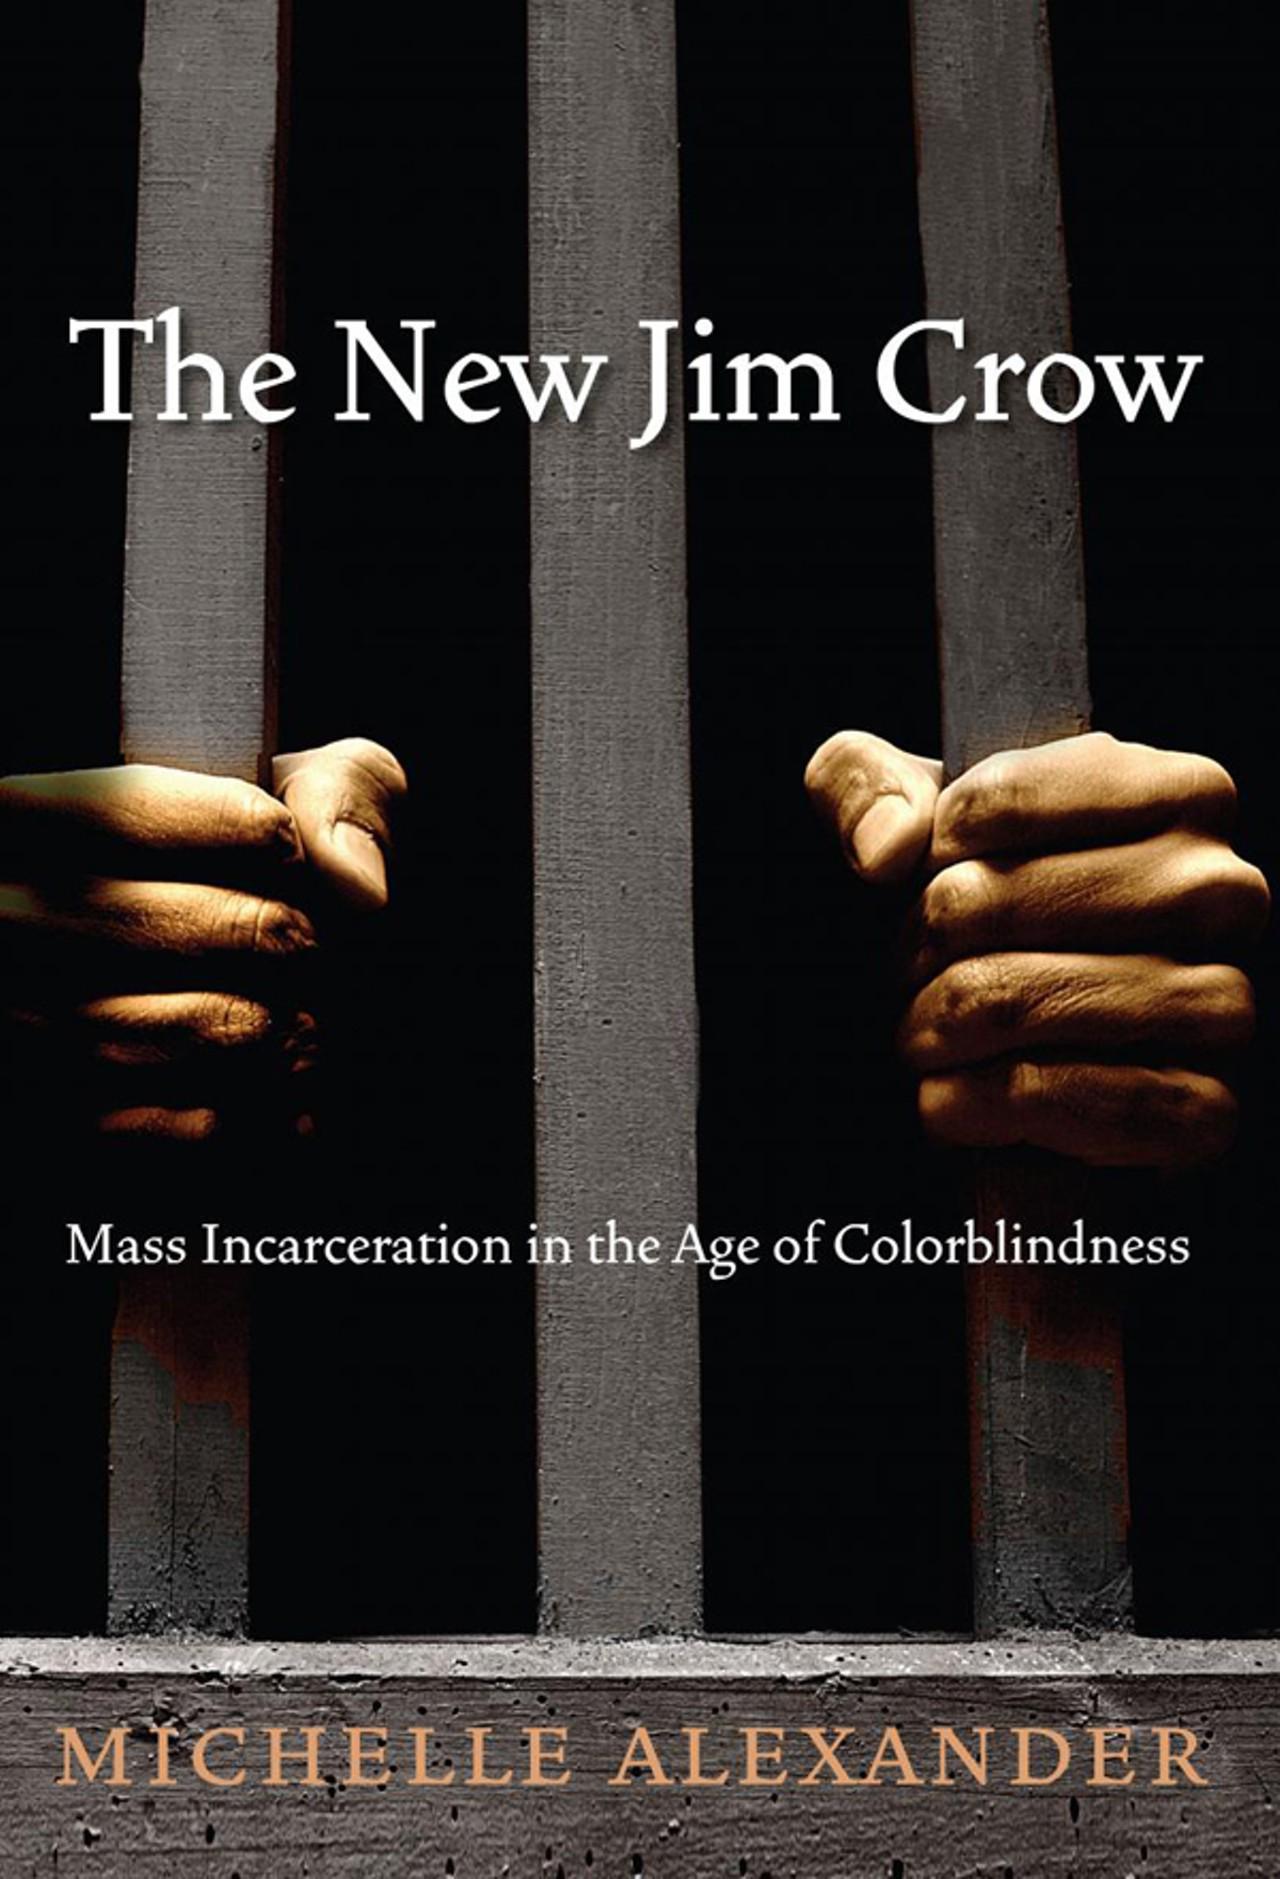 New Jim Crow Durl Nd Ltern Tives Libr Ry